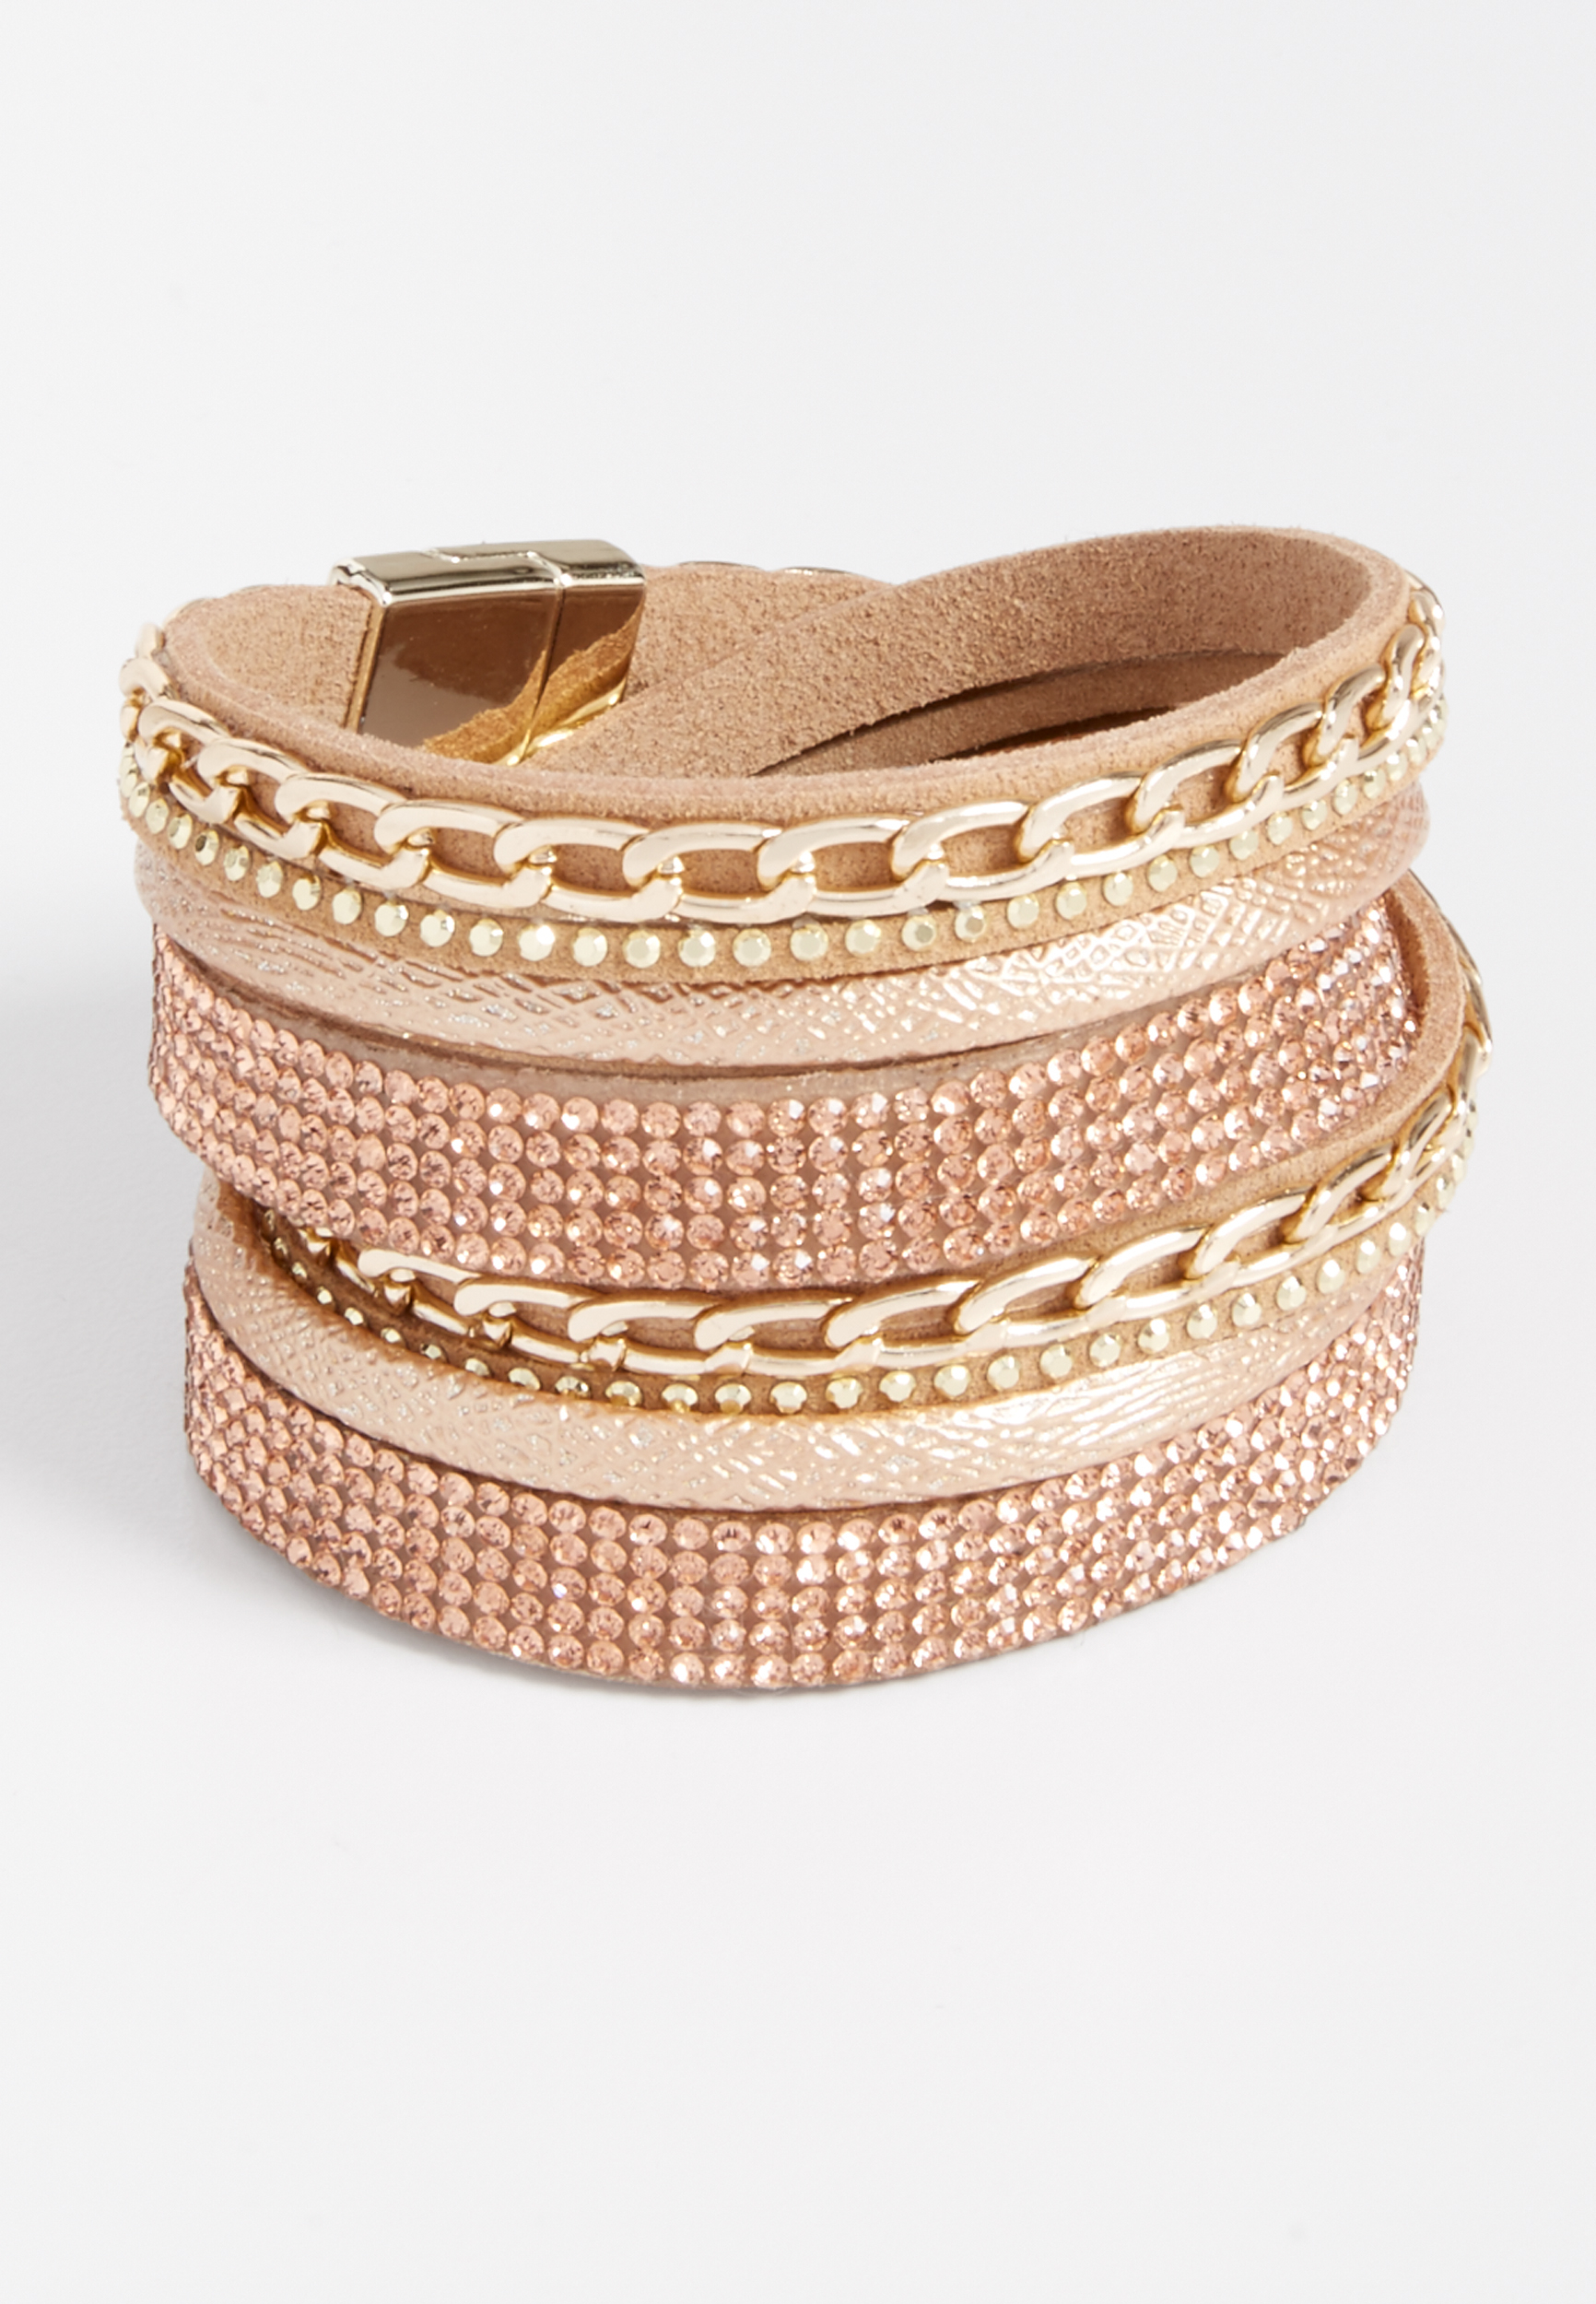 Maurices Layered Rhinestone Magnetic Bracelet